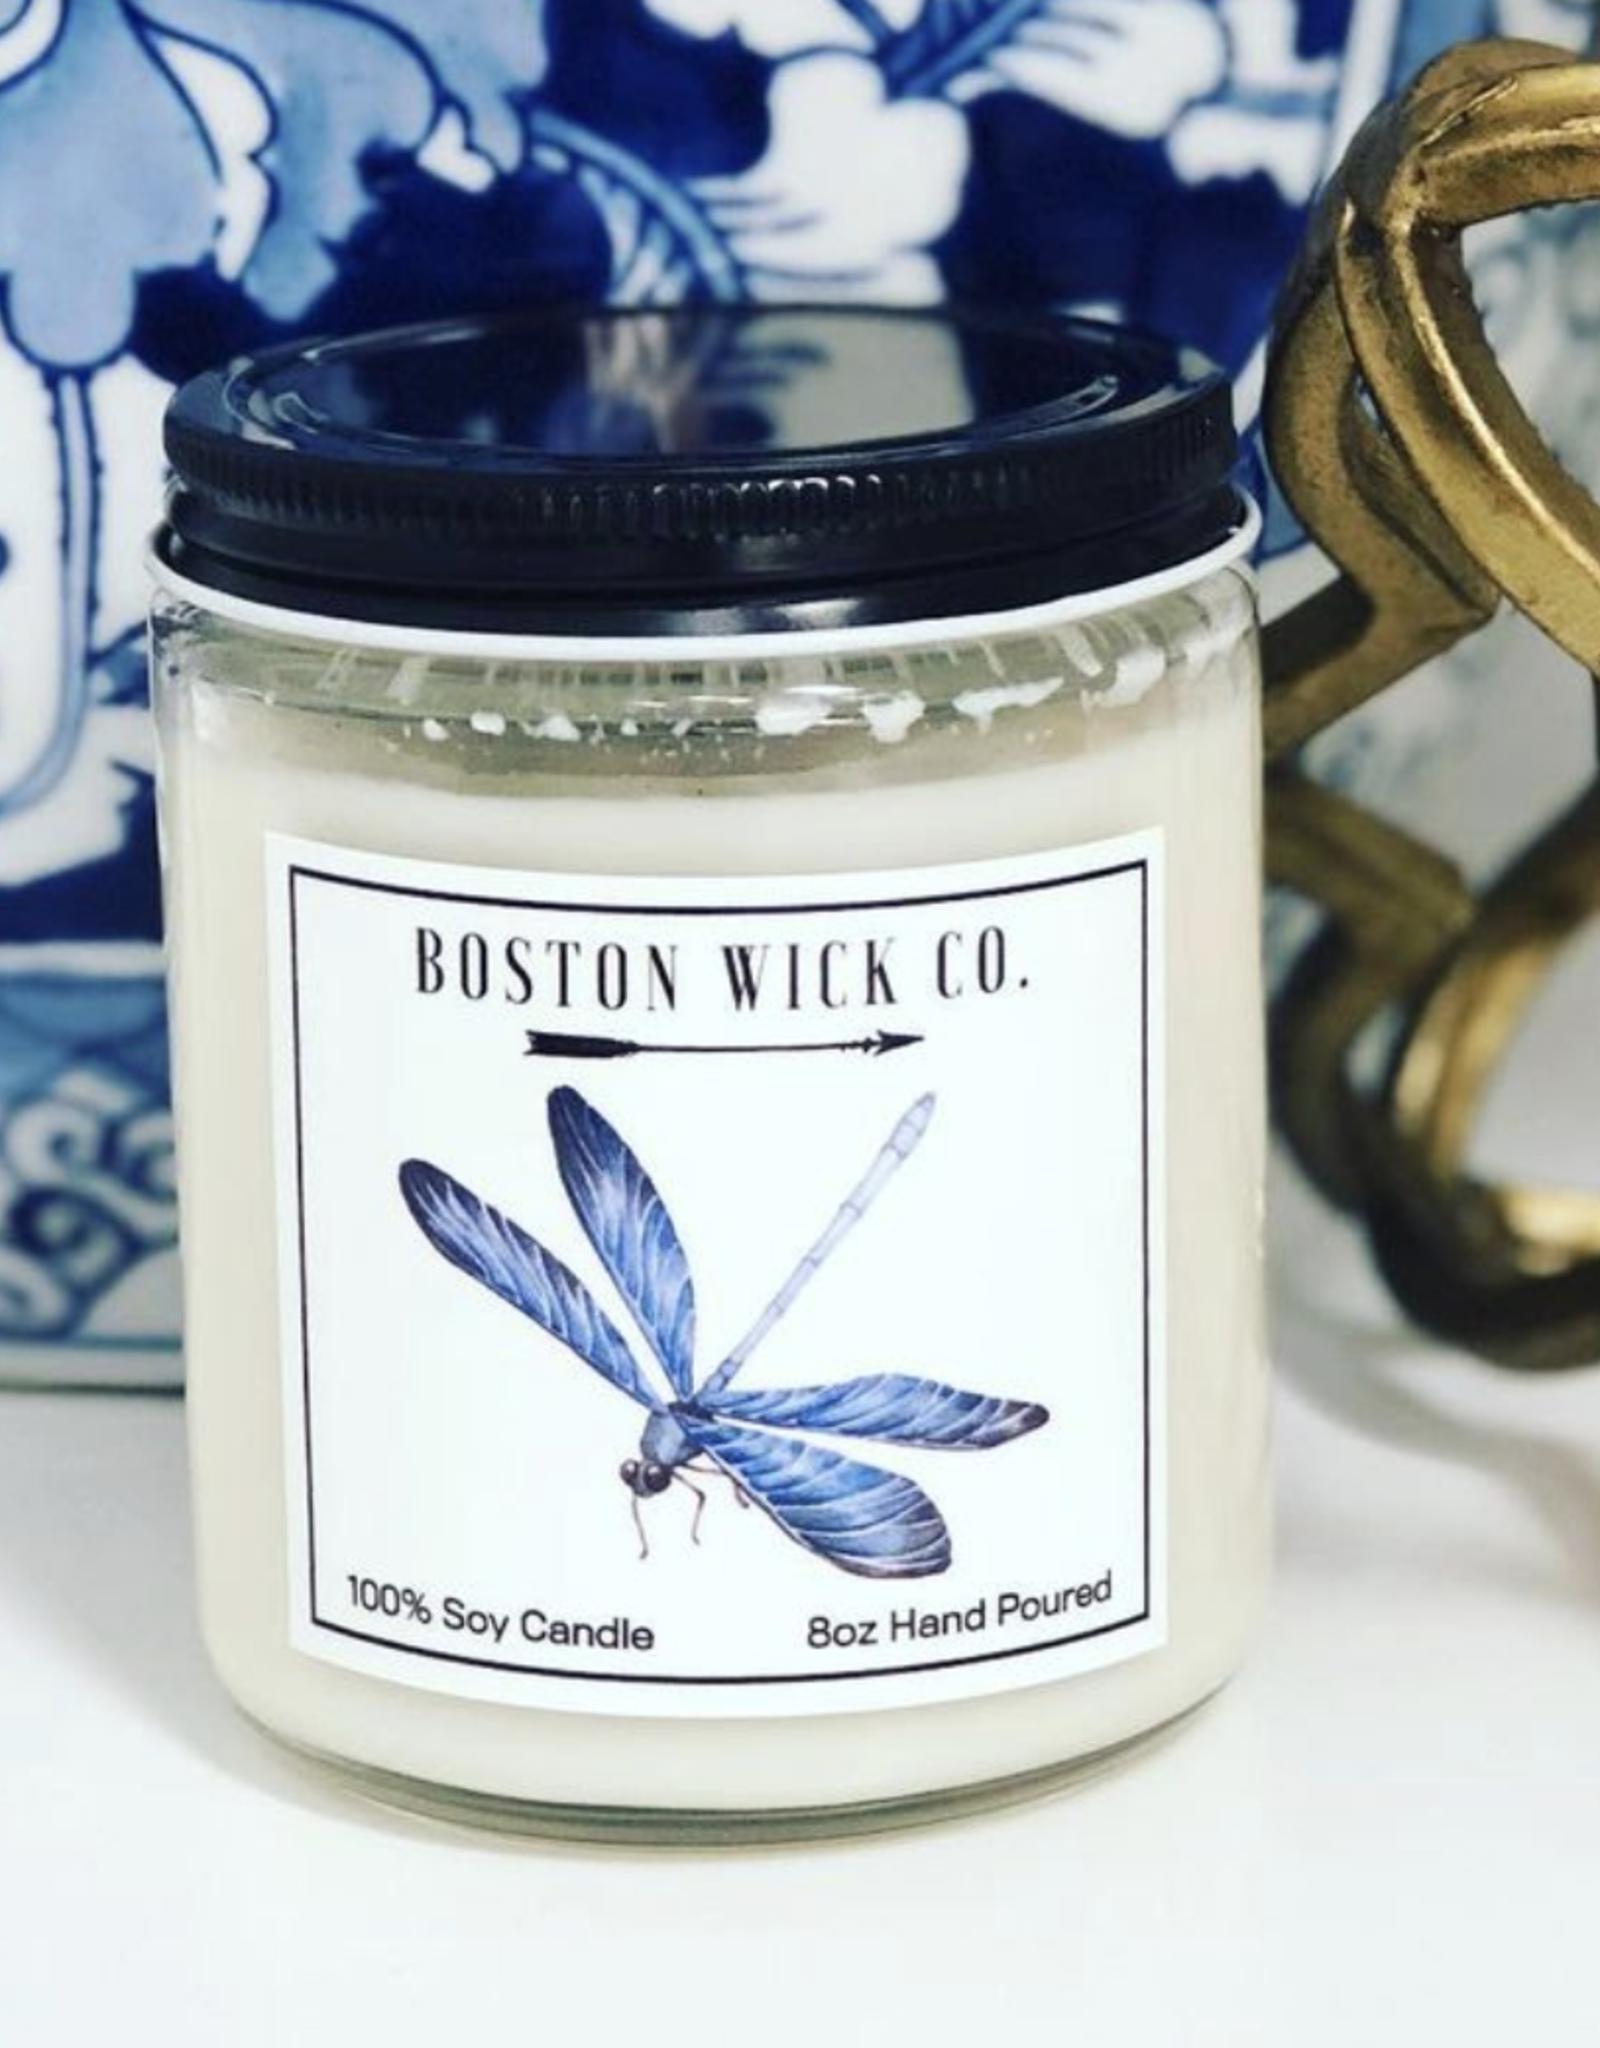 Boston Wick Boston Wick Company - Dragonfly Candle